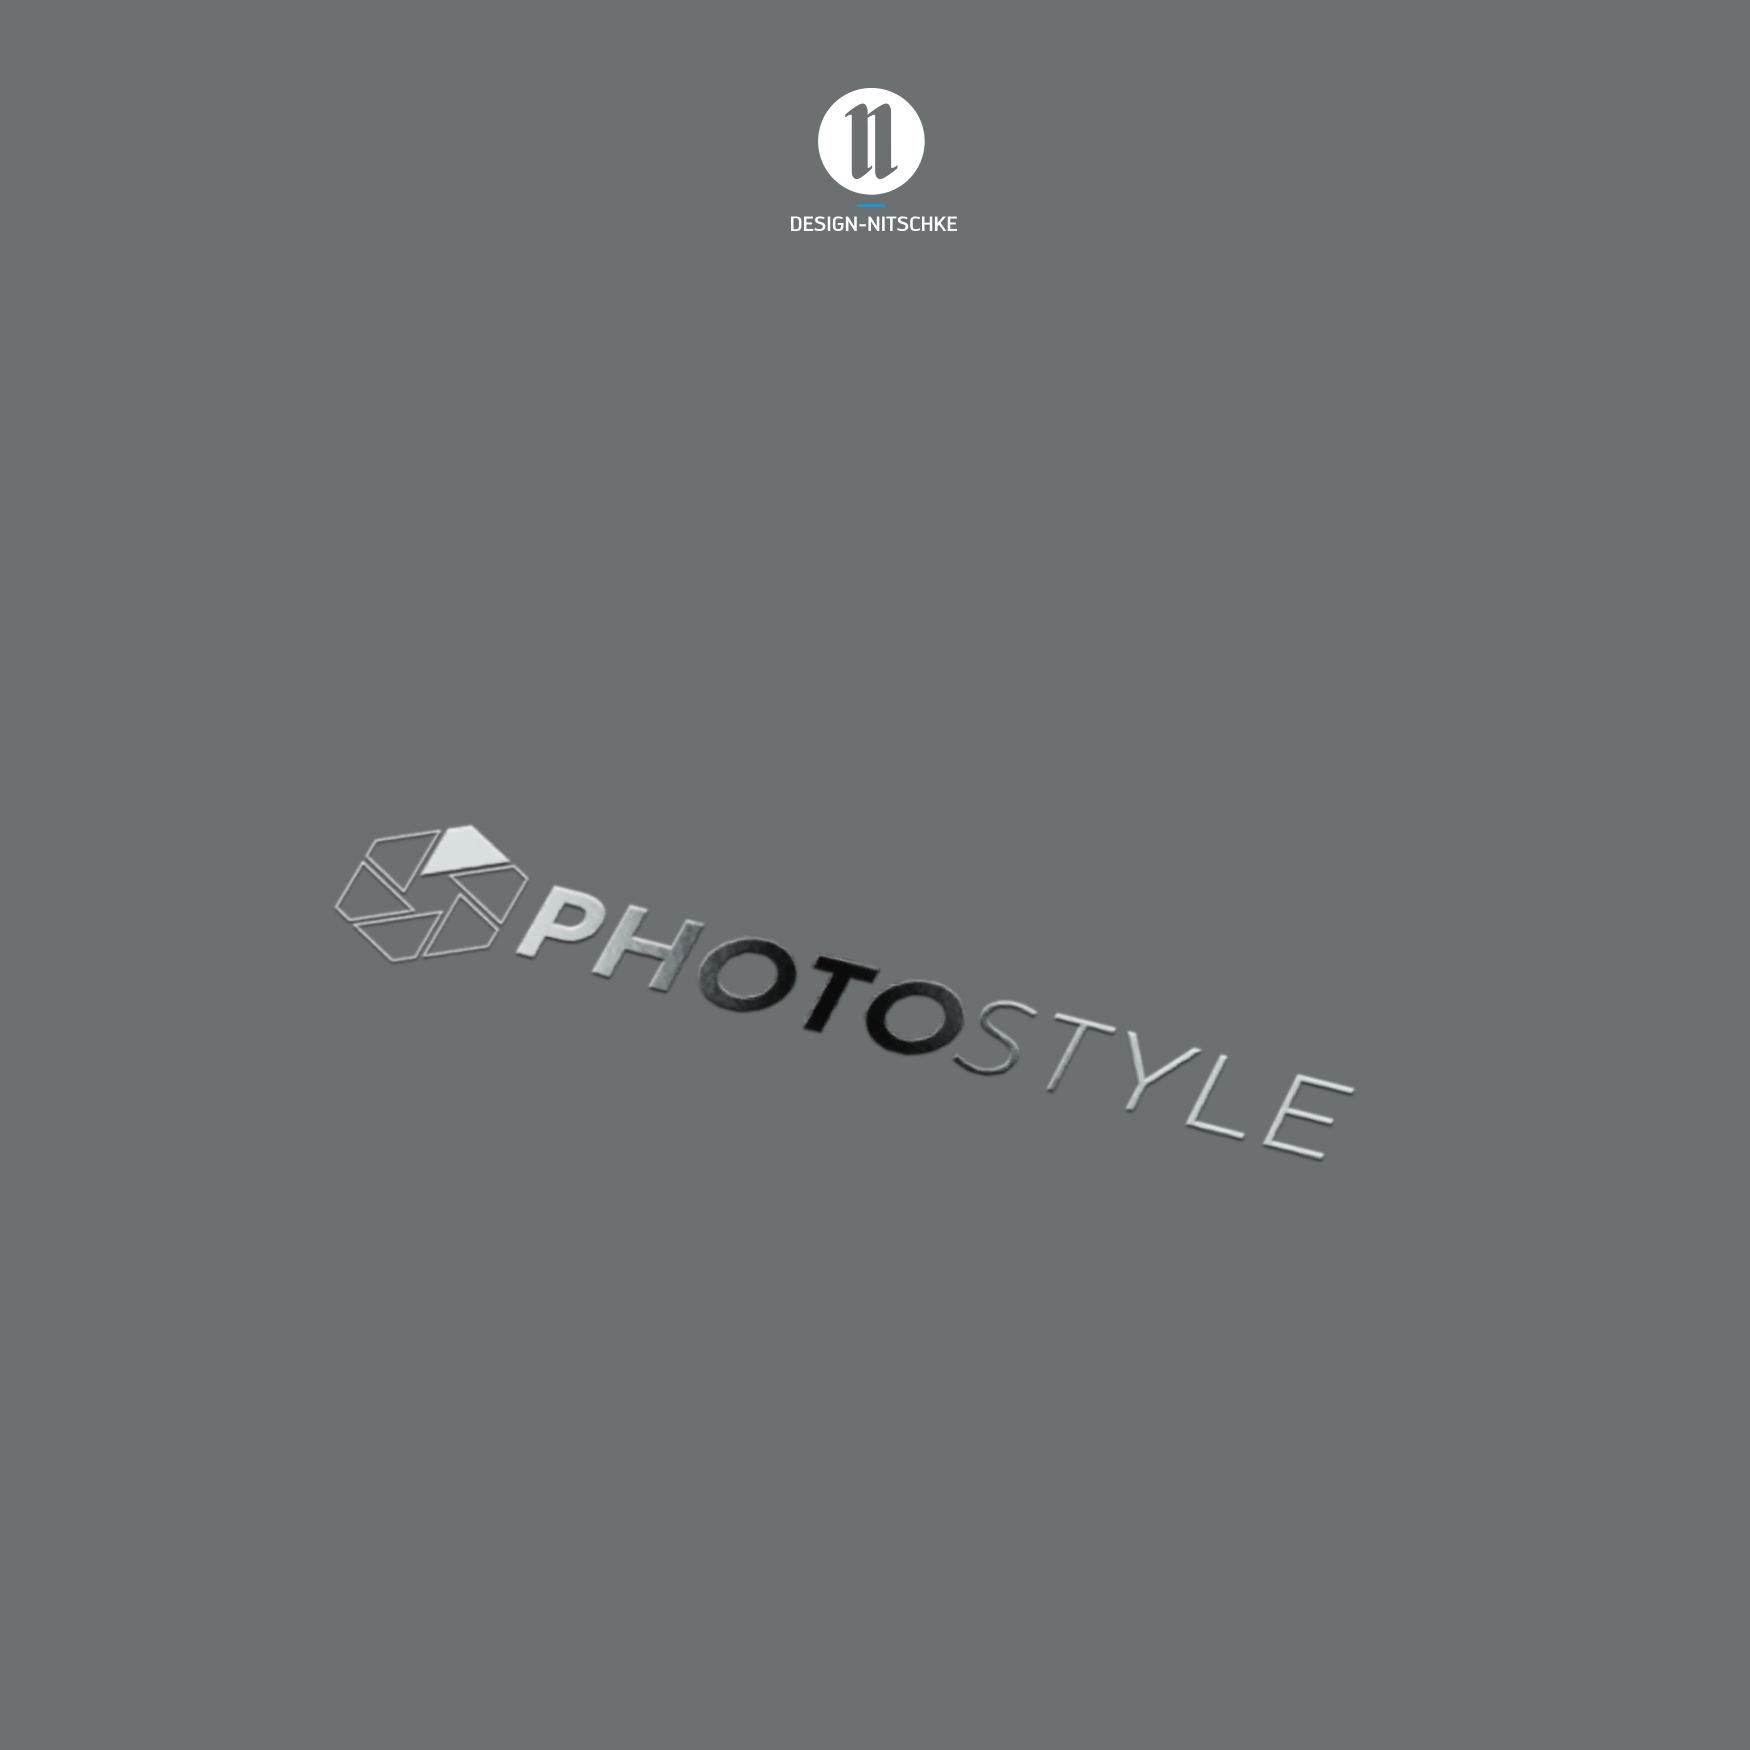 photostyle_oranienburg_grau_logo_design_ci_werbeagentur.jpg